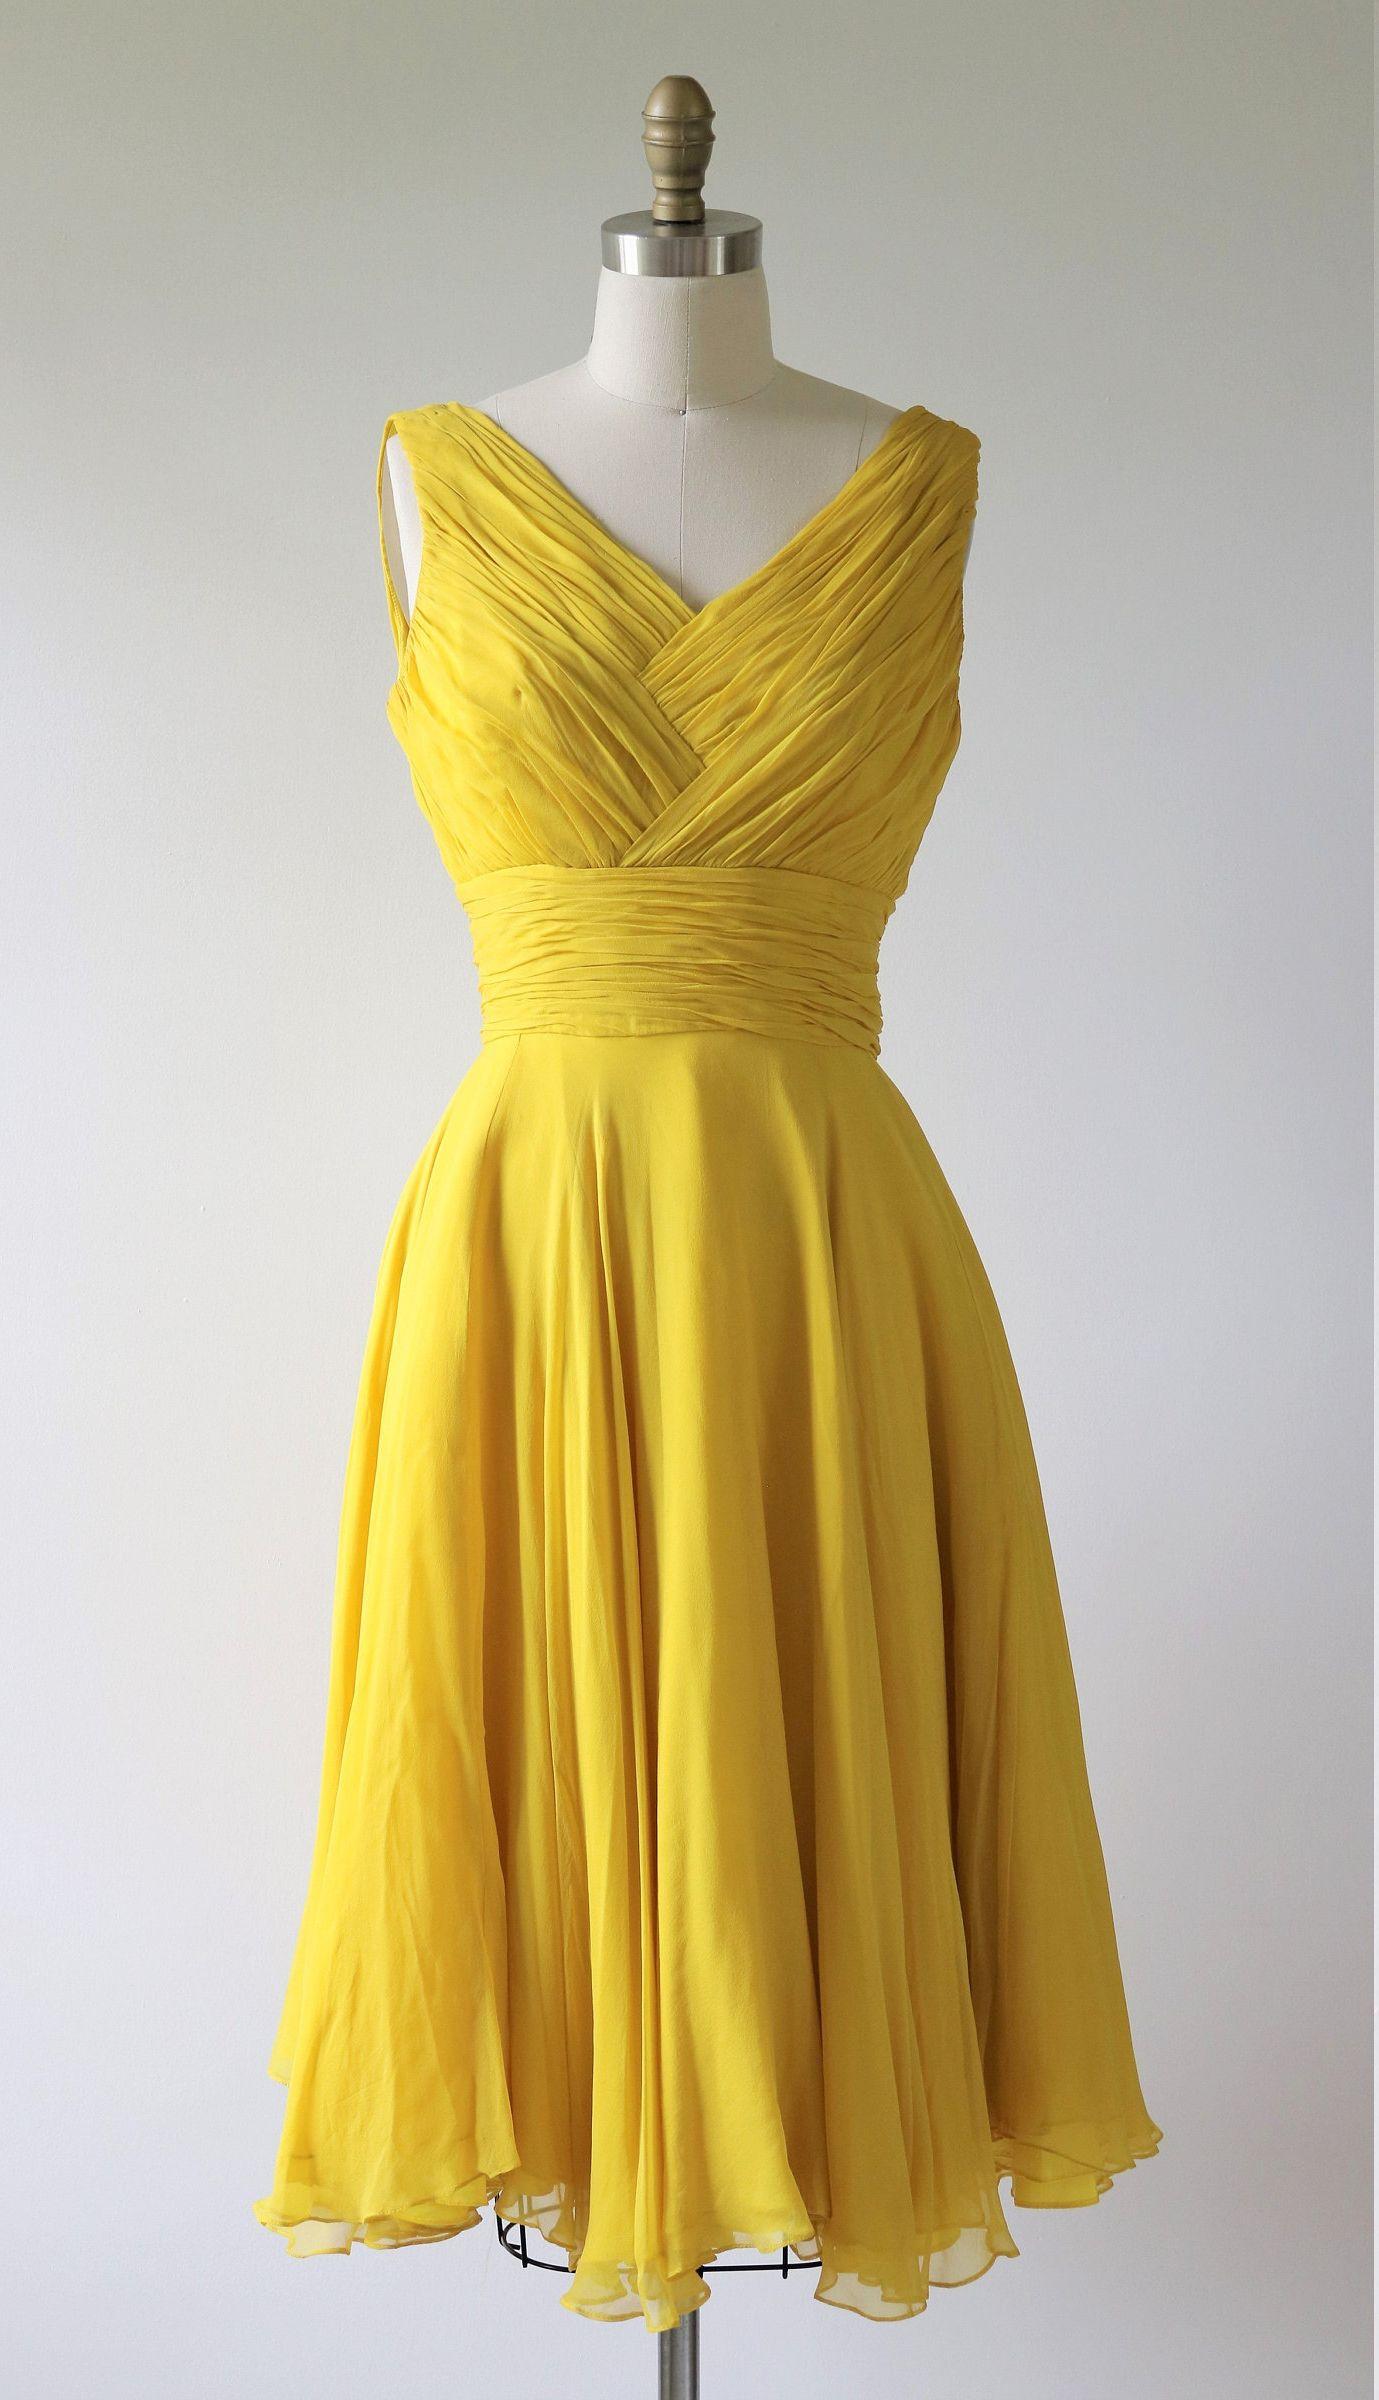 1960s Mr Frank Formal Dress Daffodil Yellow Ruched Sleeveless Etsy Dresses Formal Dresses Vintage Dresses [ 2400 x 1379 Pixel ]